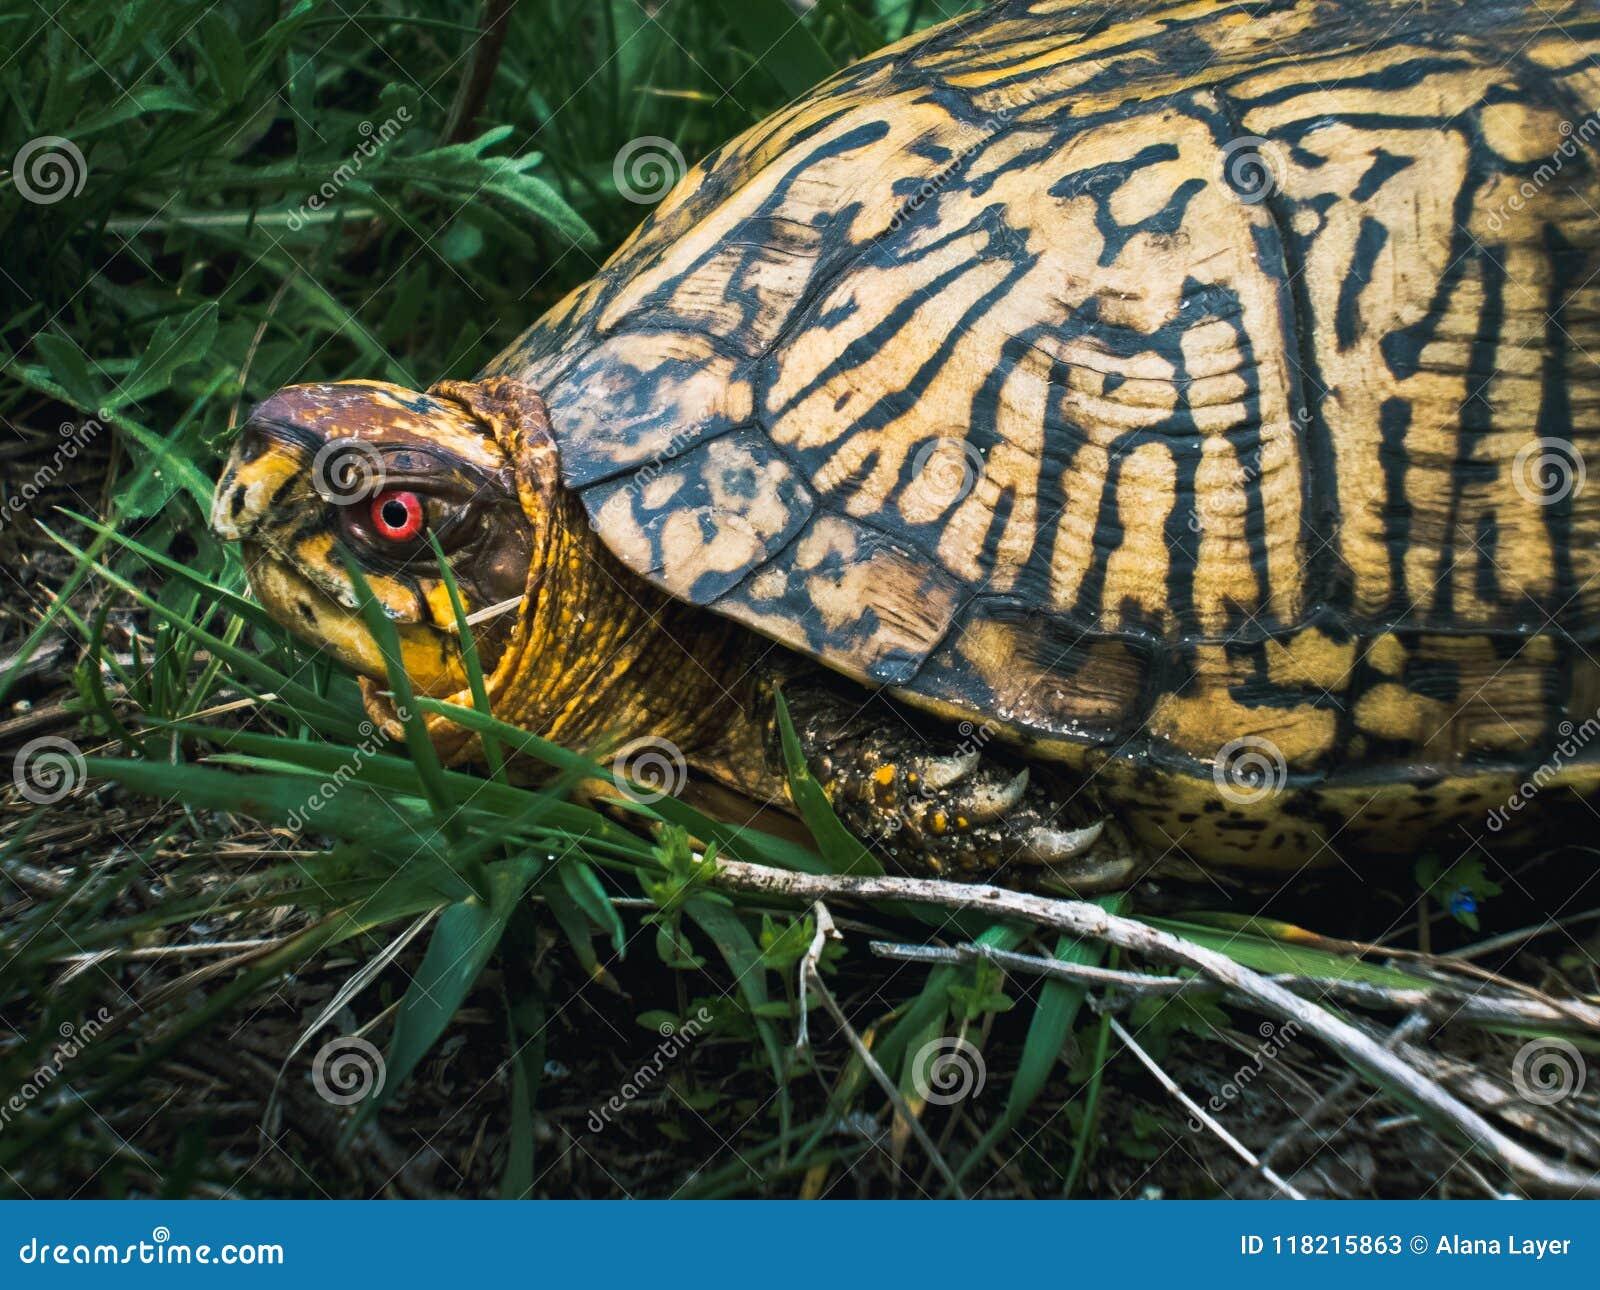 Male Eastern Box Turtle Side Profile